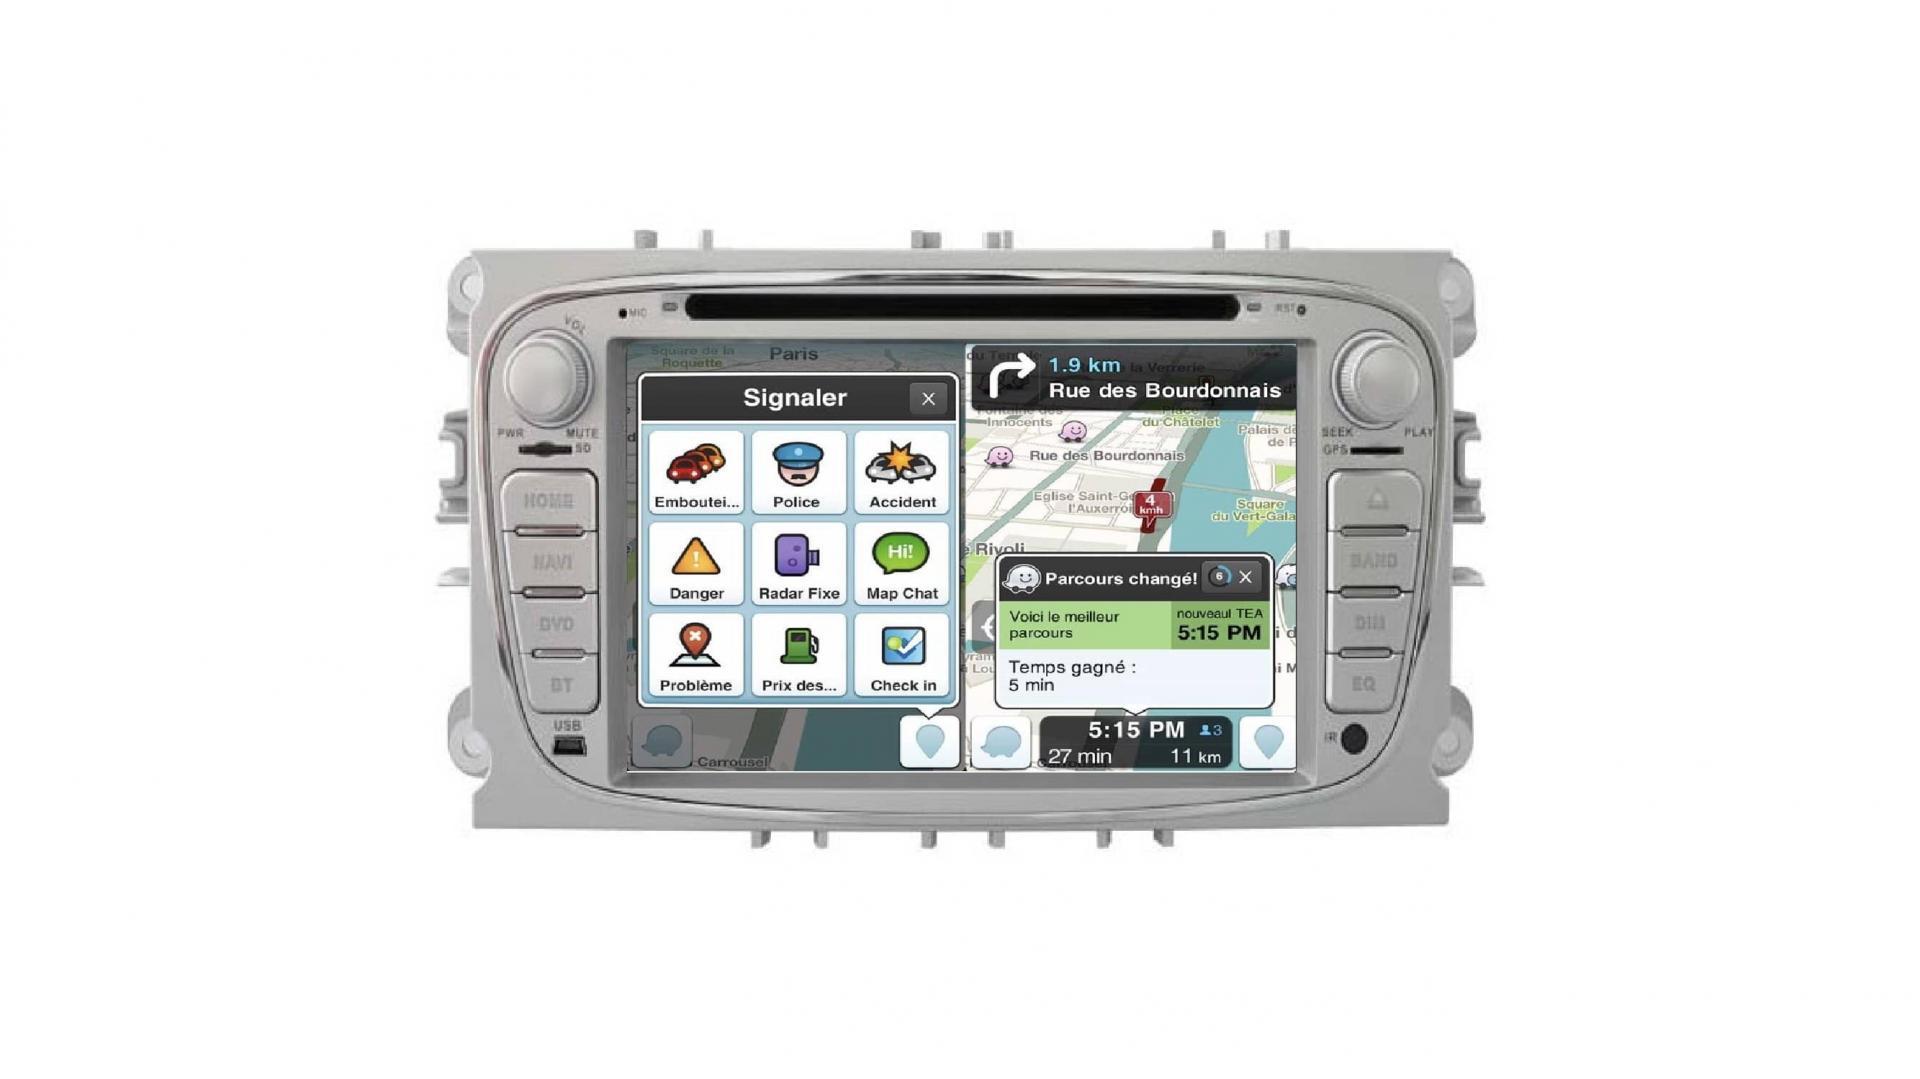 Autoradio s max galaxy mondeo focus autoradio gps bluetooth android auto carplay camera de recul commande au volant3